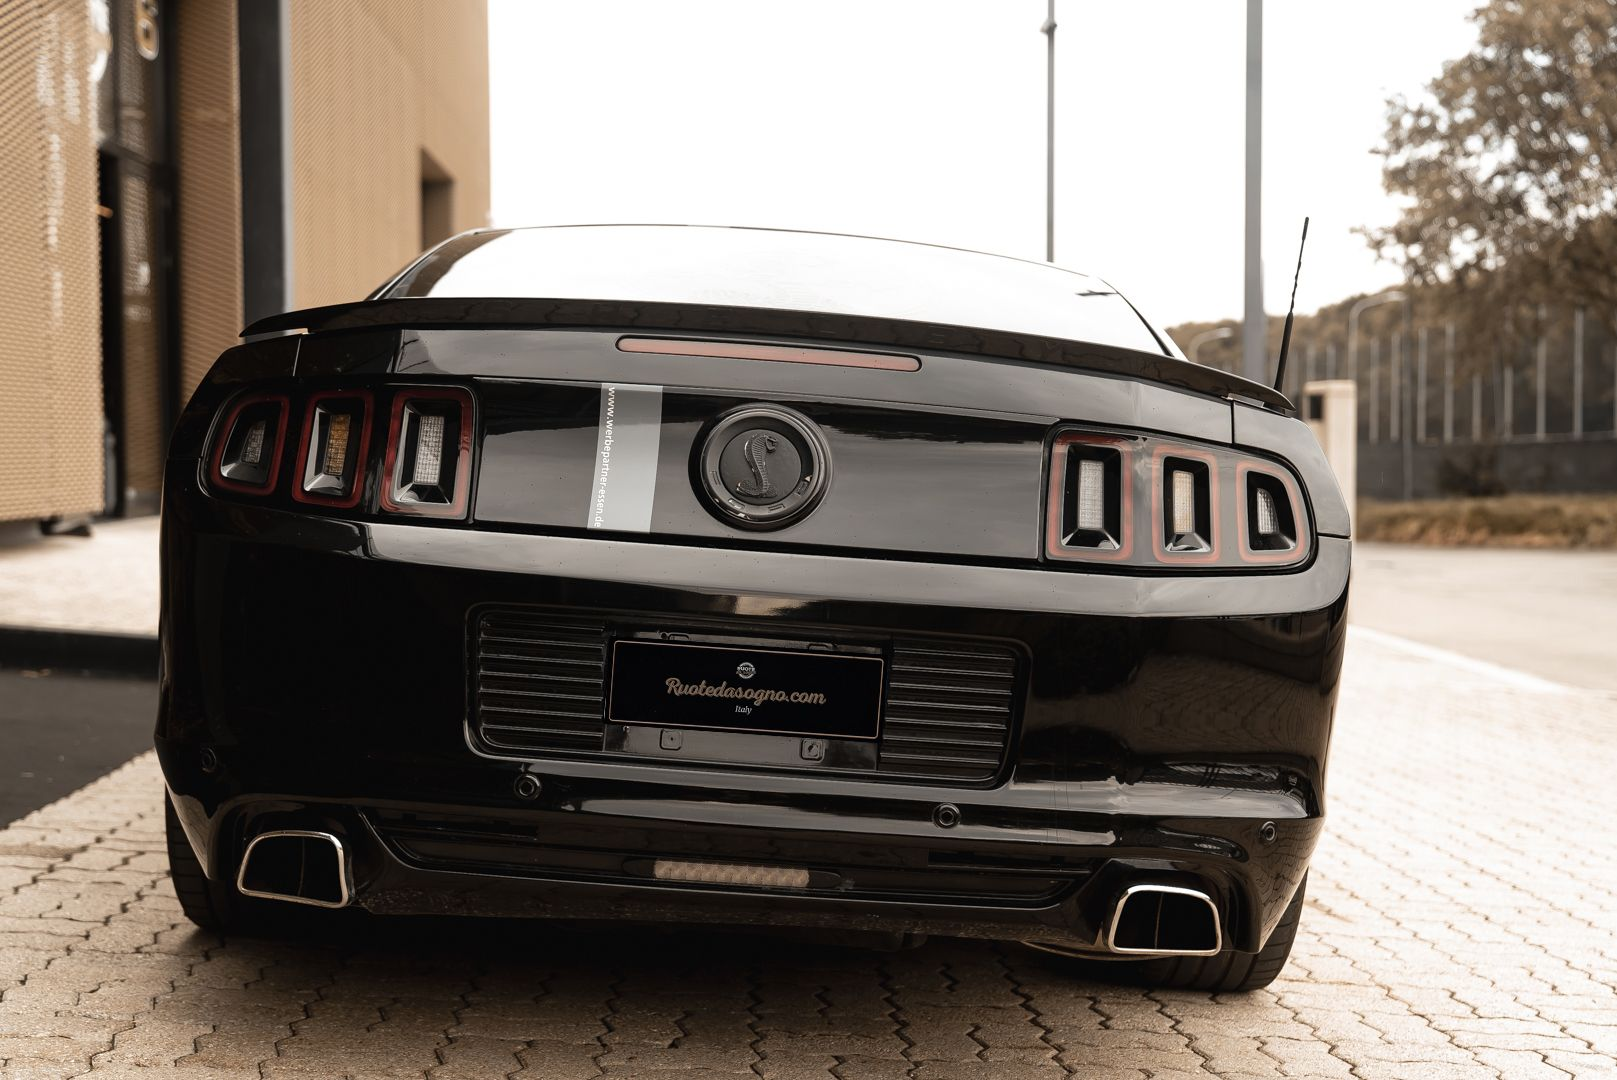 2012 Ford Mustang 5.0 V8 82060